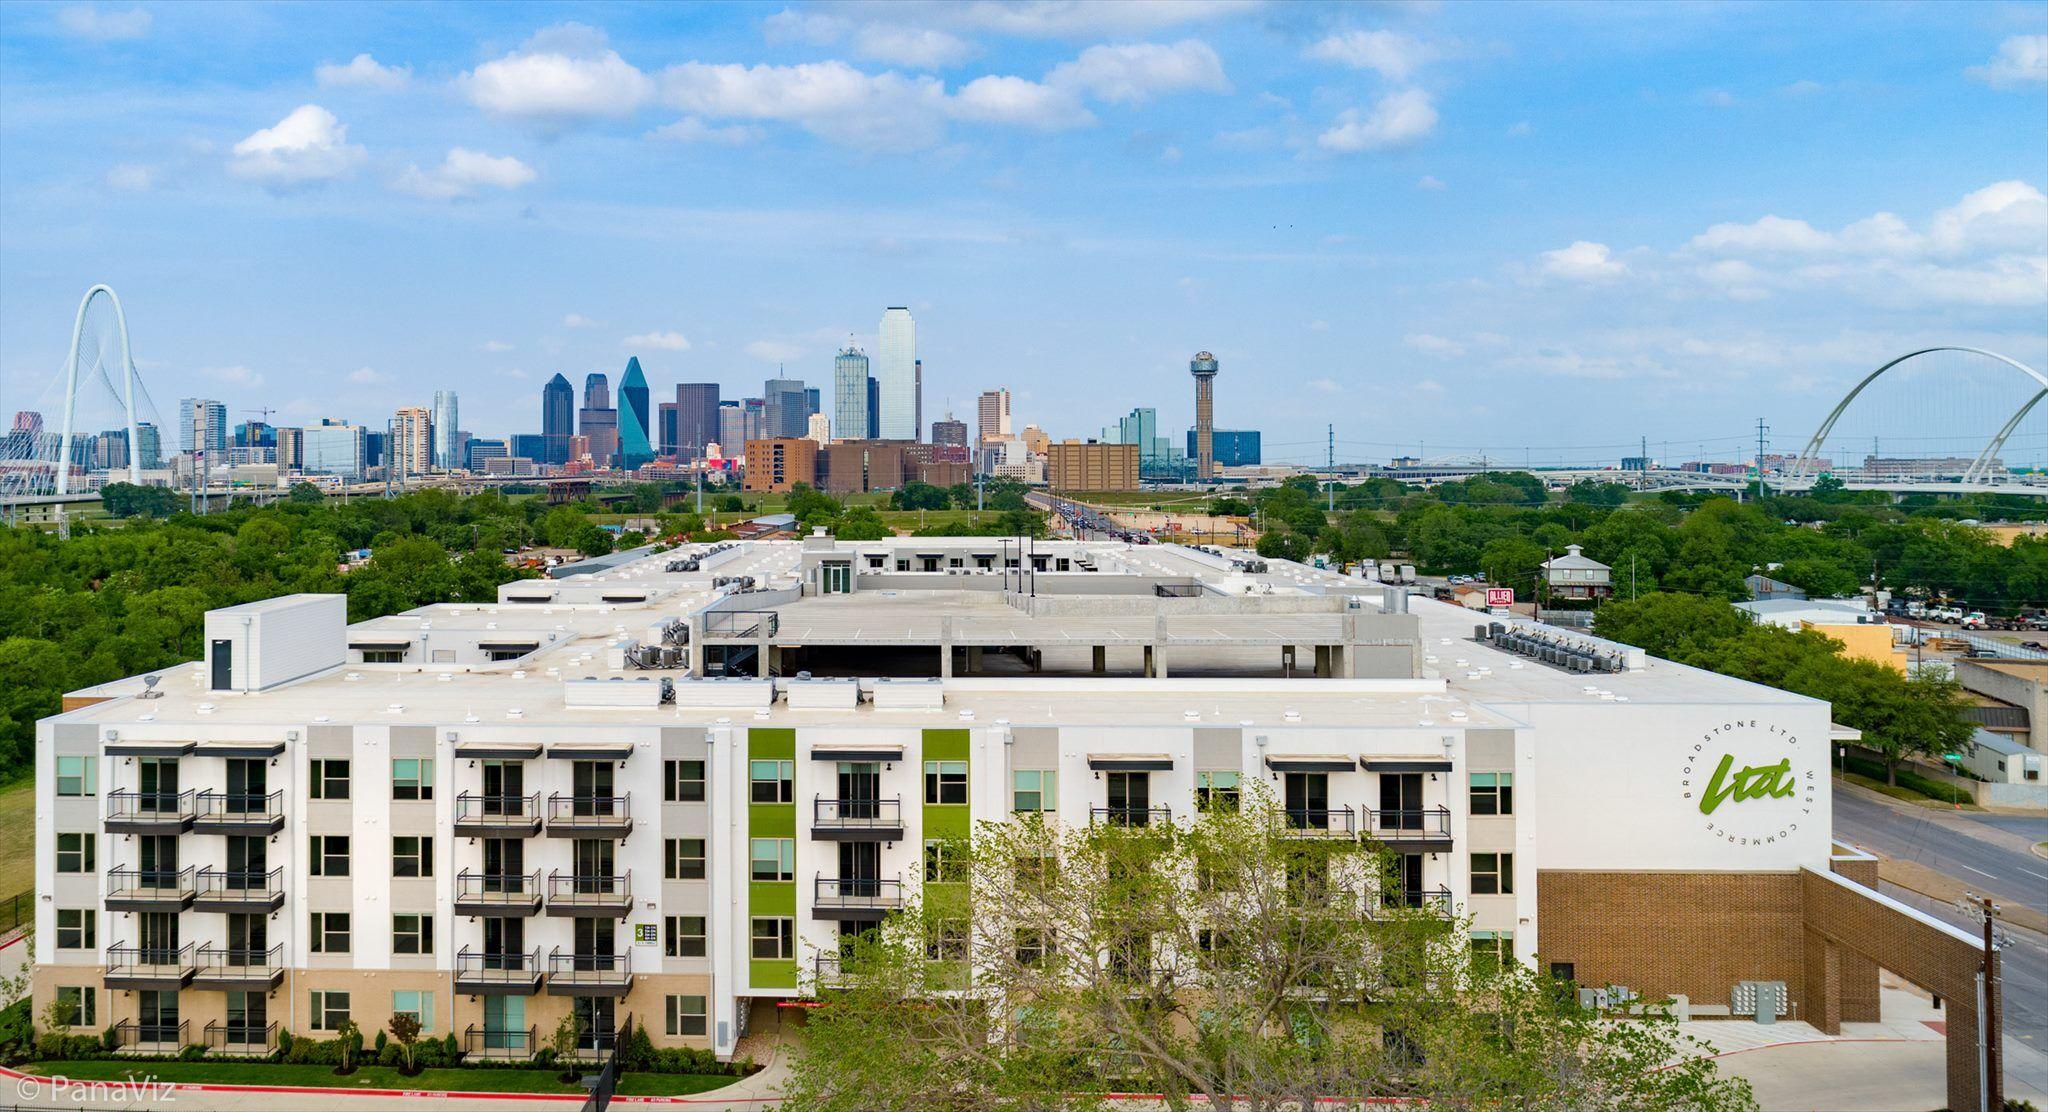 Texas Apartment Photography - Exterior